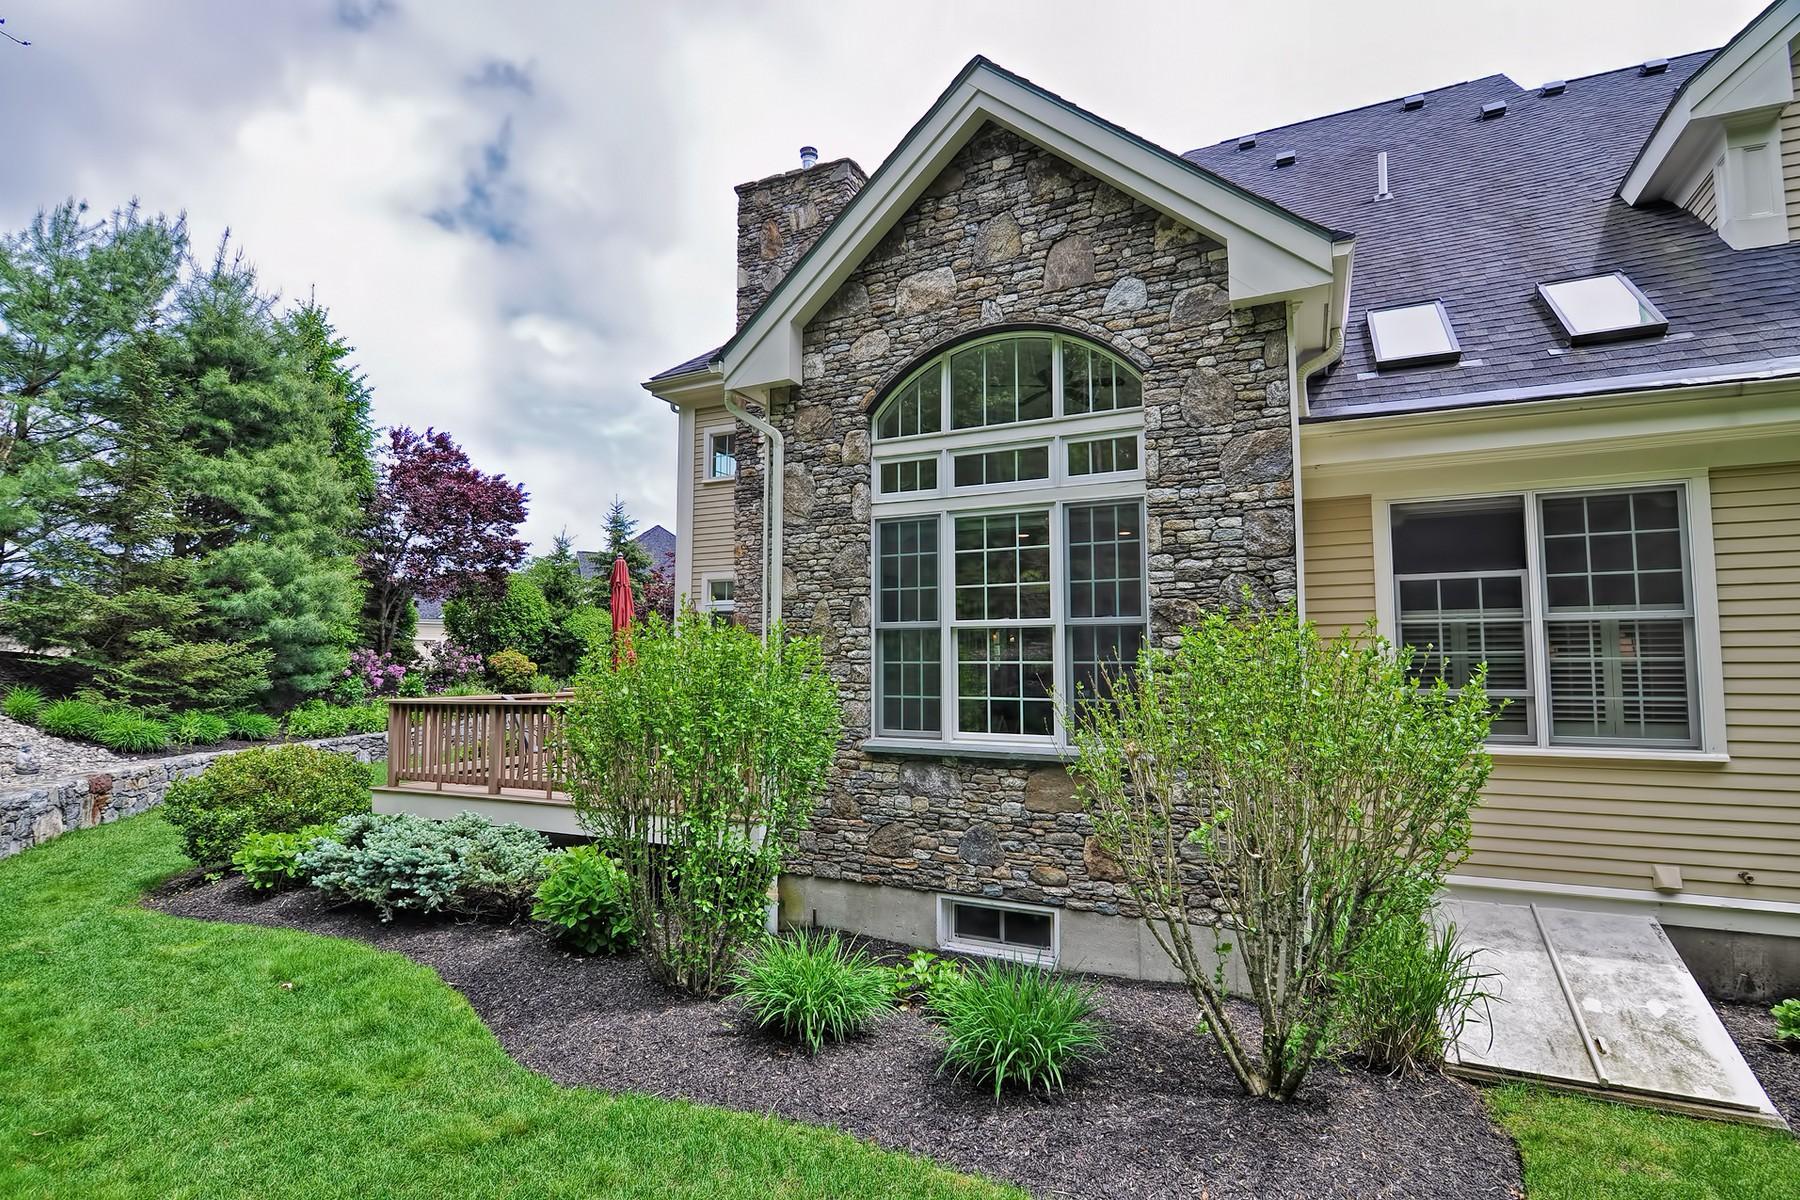 Condomínio para Venda às Luxury Living - Villas At Pleasant Valley 26 Tournament Way, Unit 26 Sutton, Massachusetts, 01590 Estados Unidos